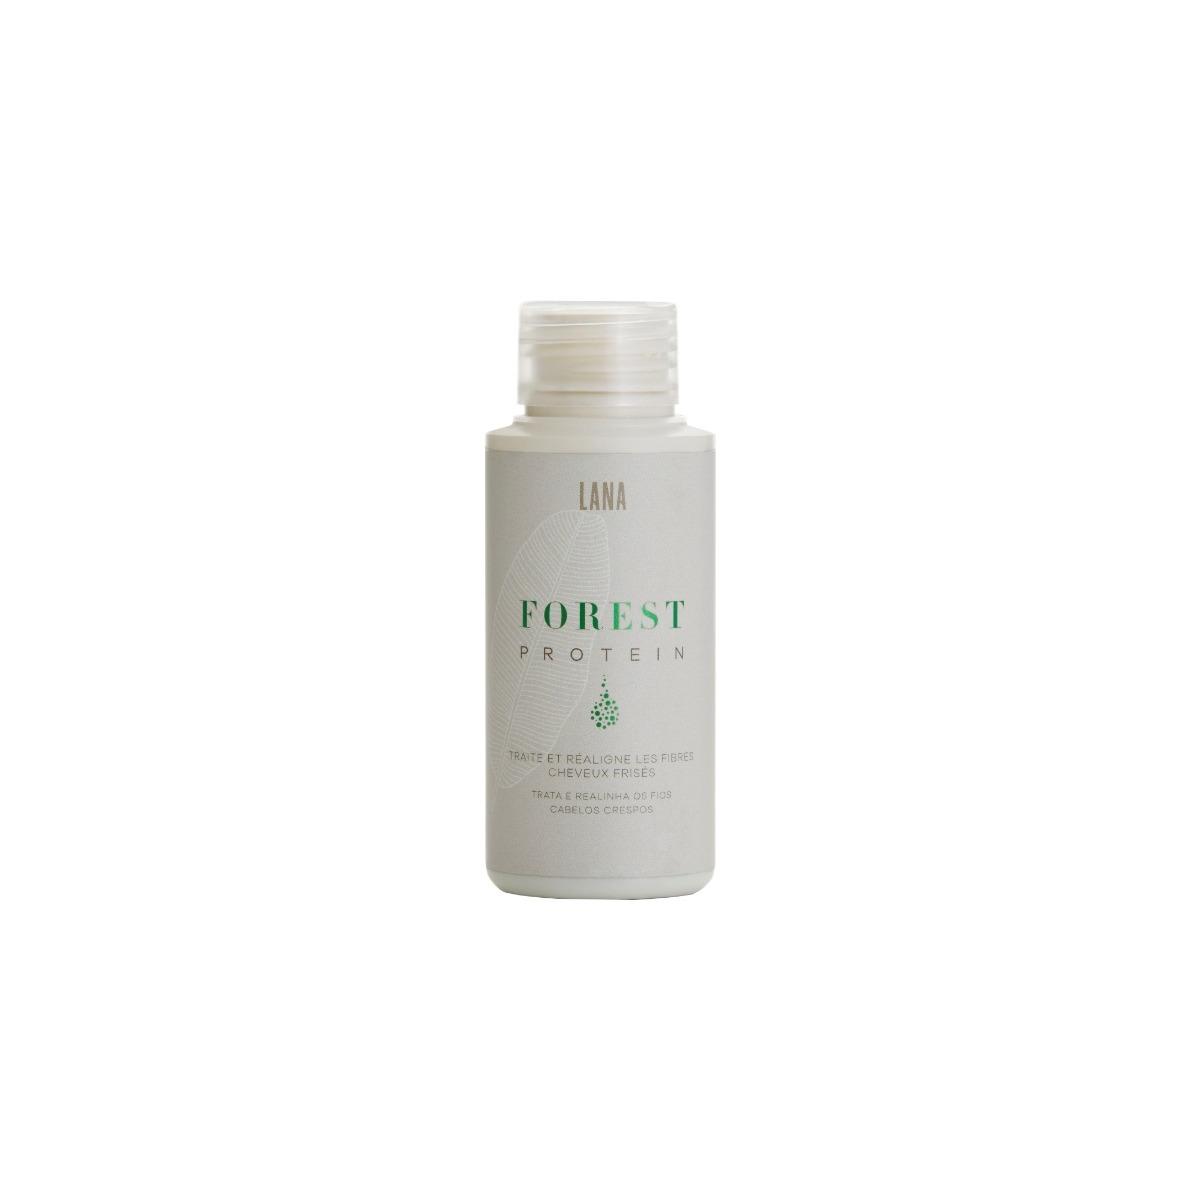 Lana Brasiles - Forest Protein 100ml